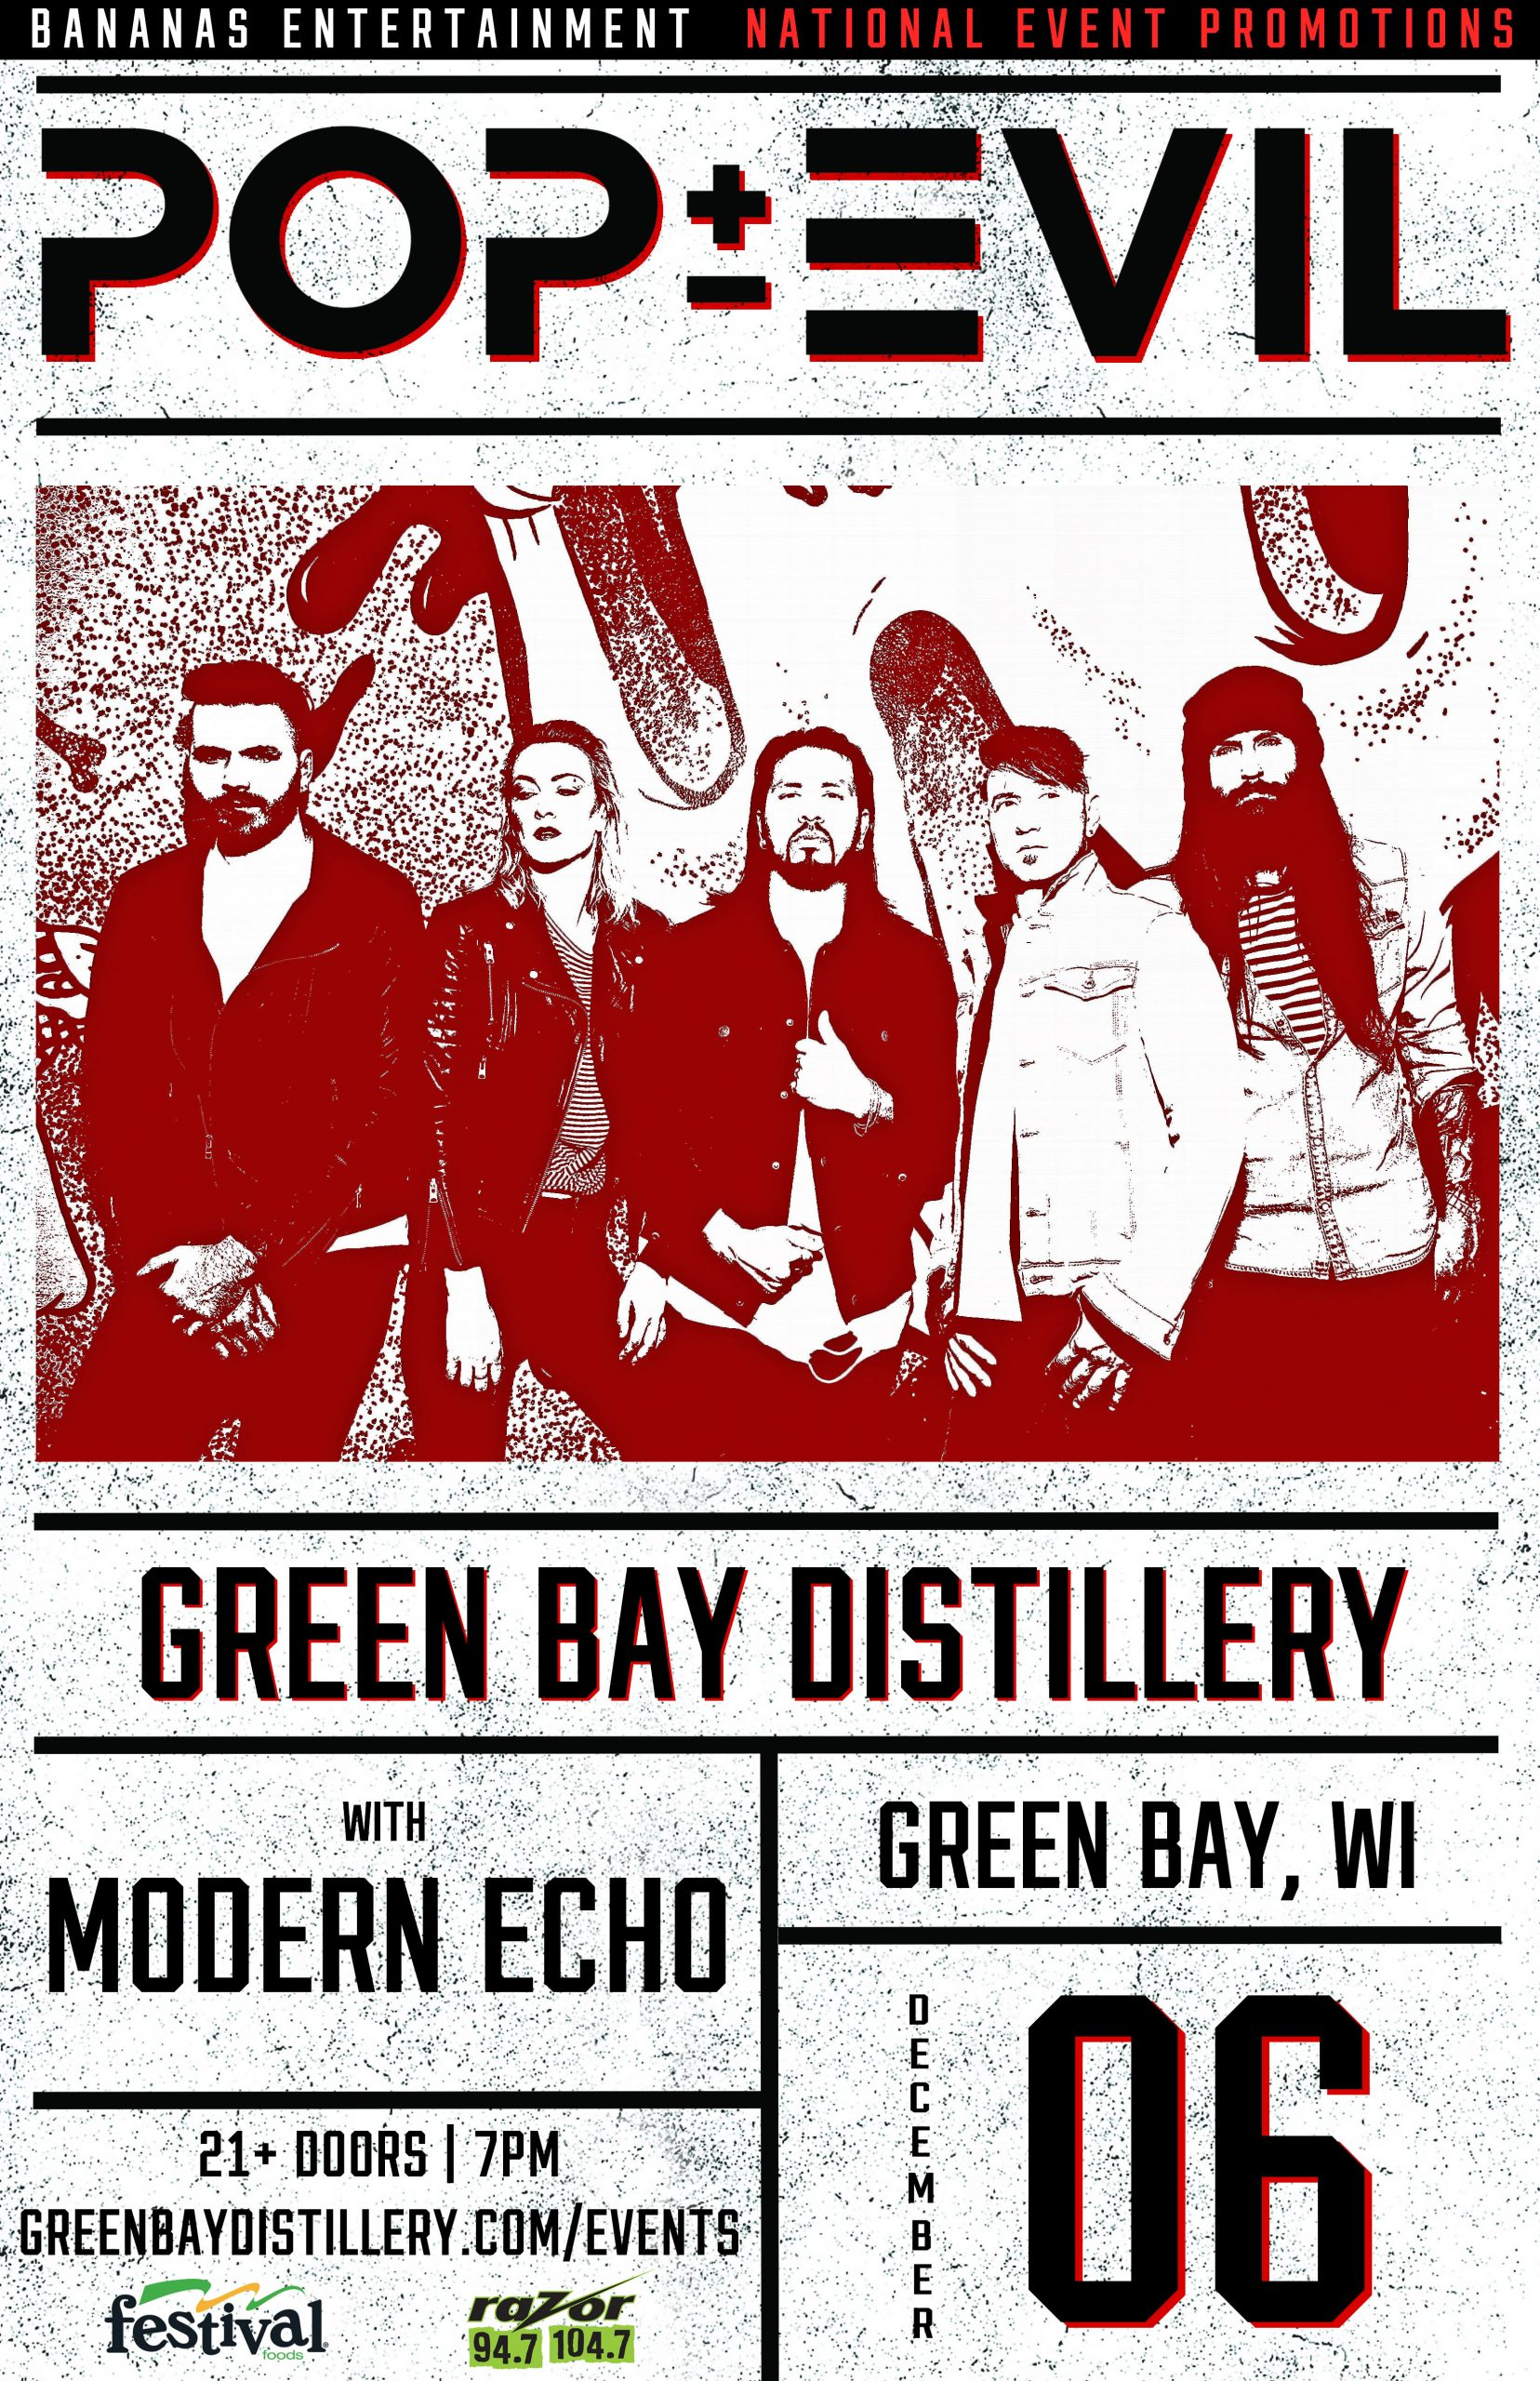 CONTEST: Pop Evil | Green Bay Distillery